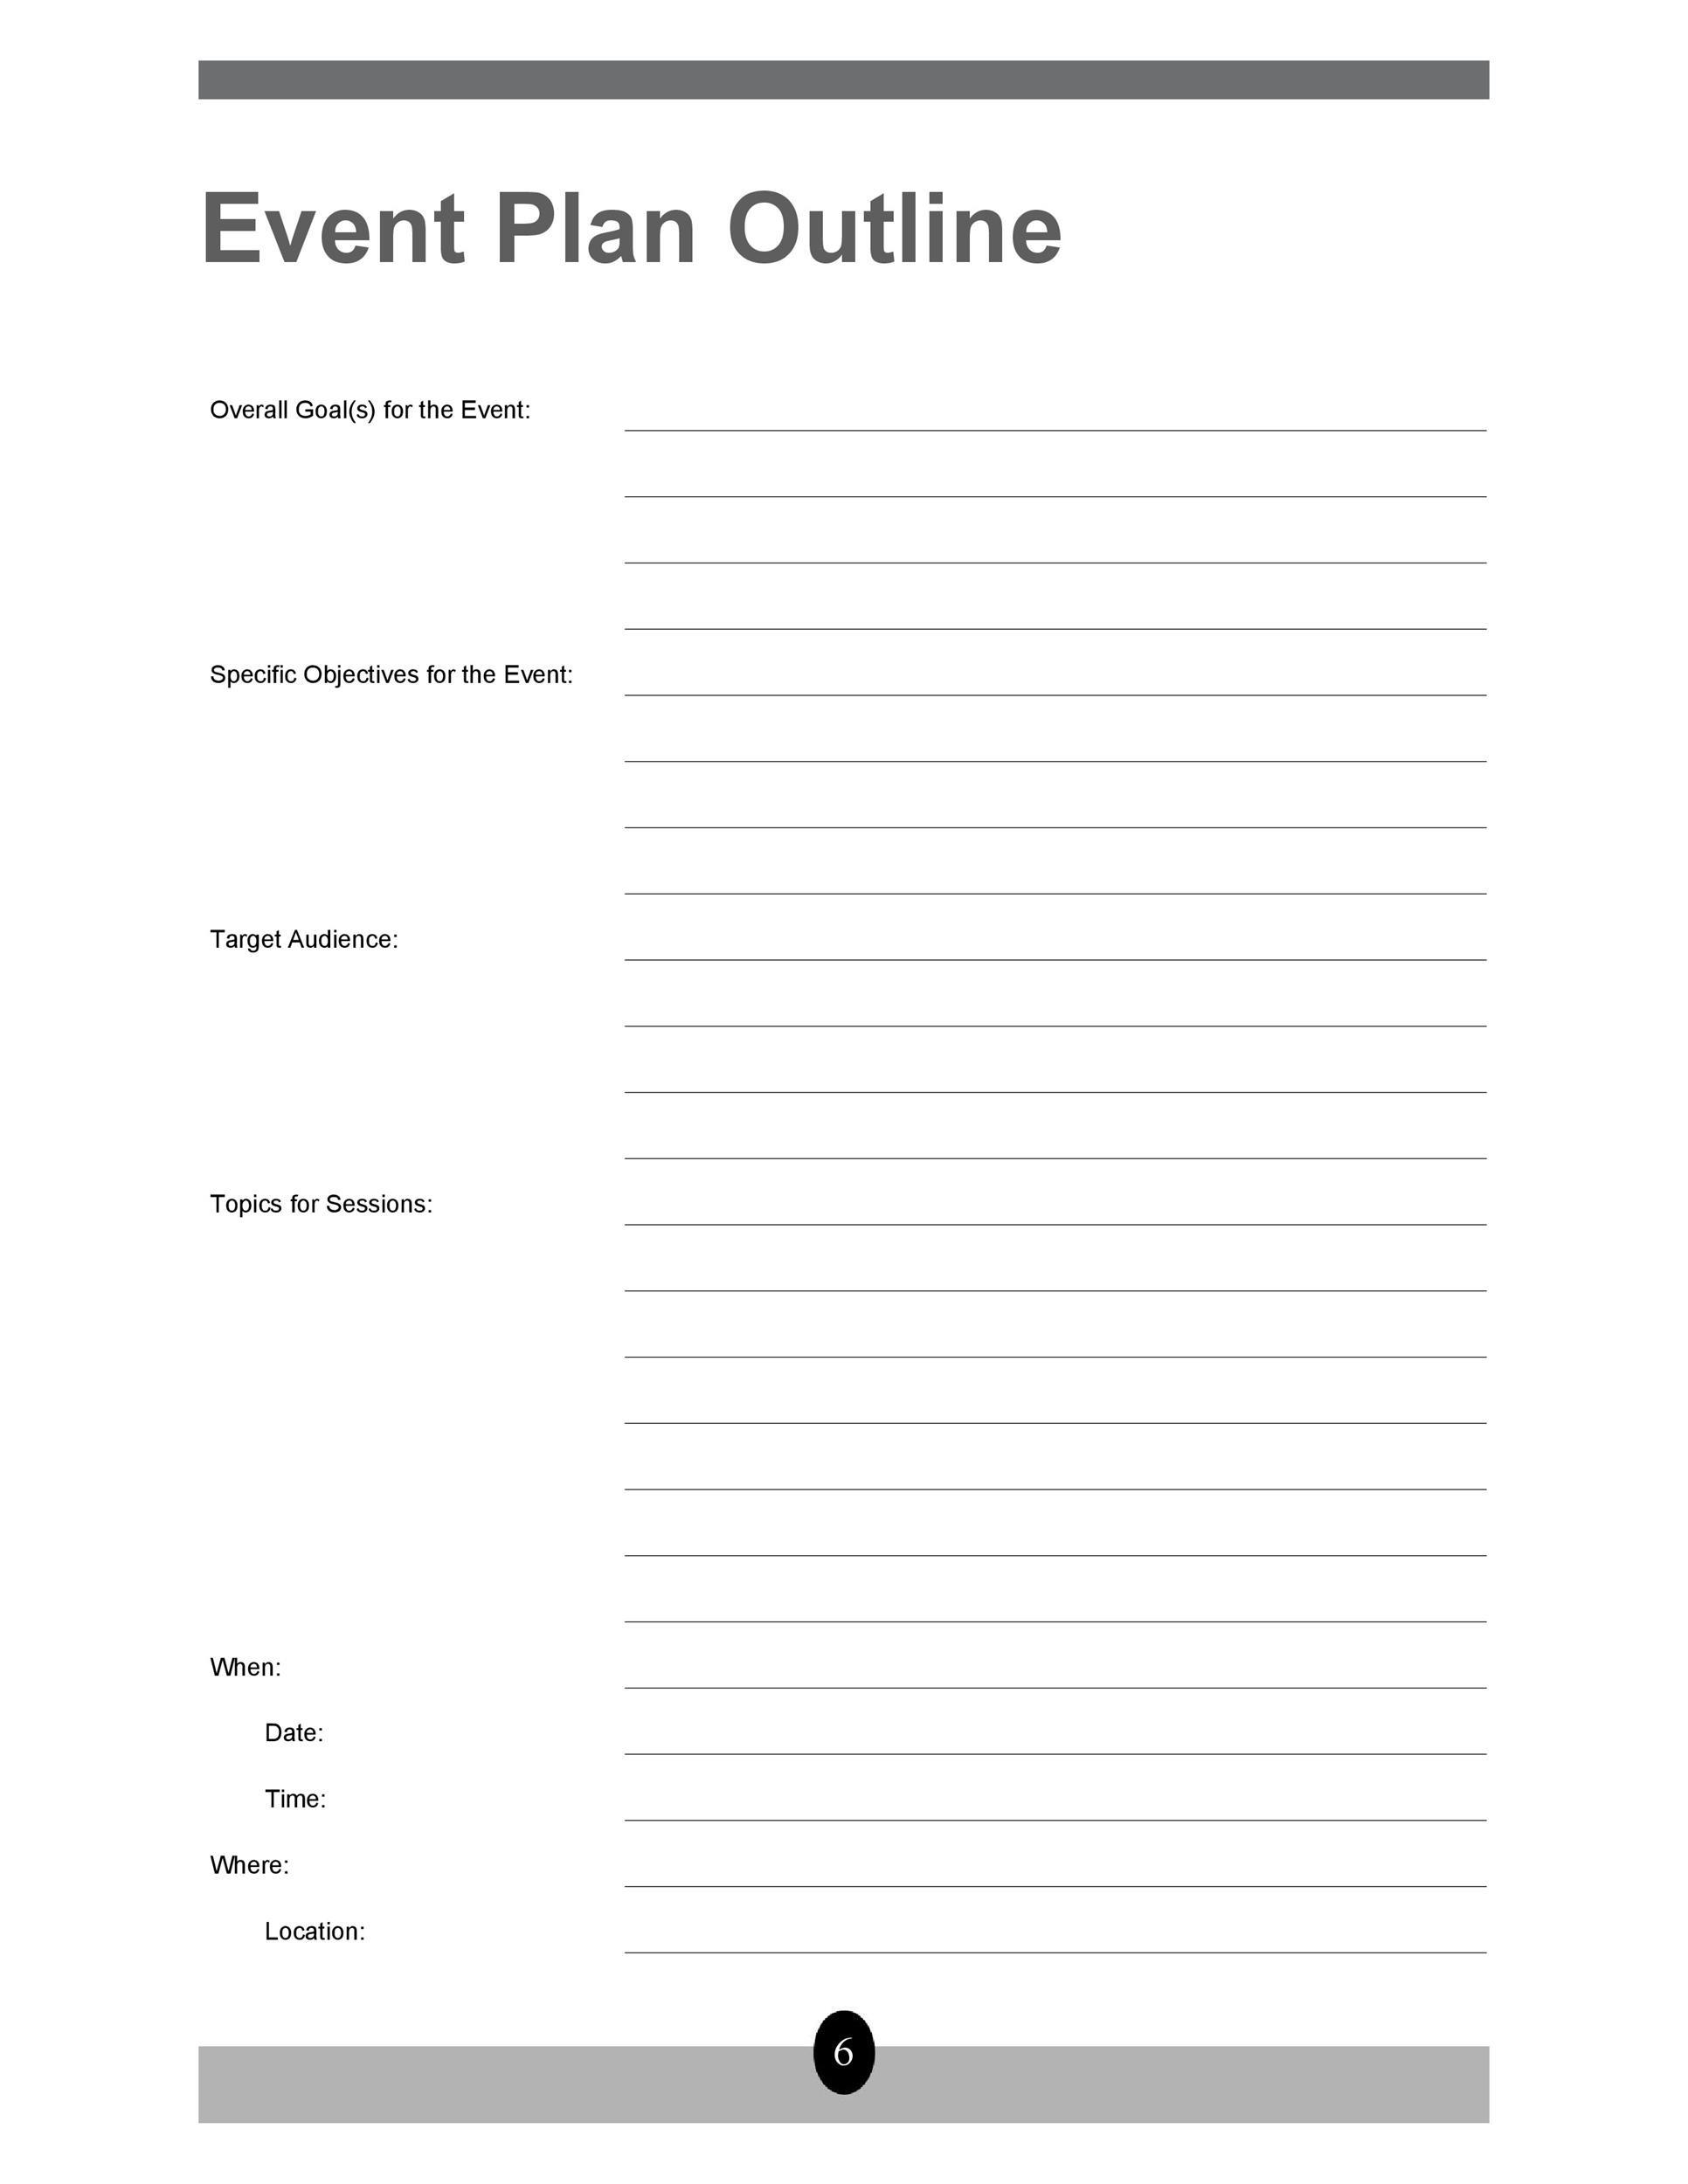 50 professional event planning checklist templates  u1405 template lab